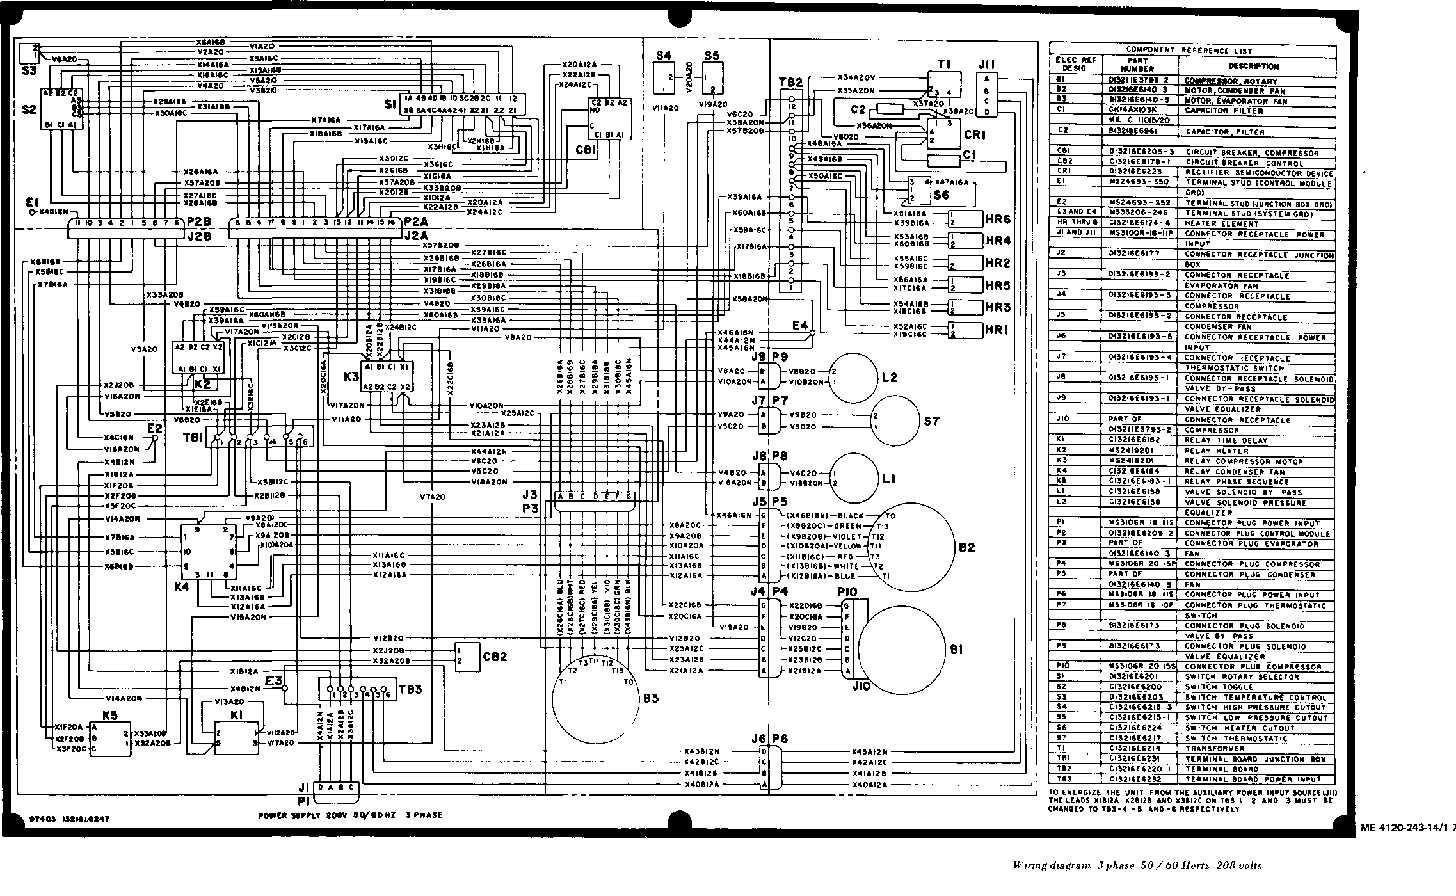 120 240 motor wiring diagram 4l80e delta high leg bank get free